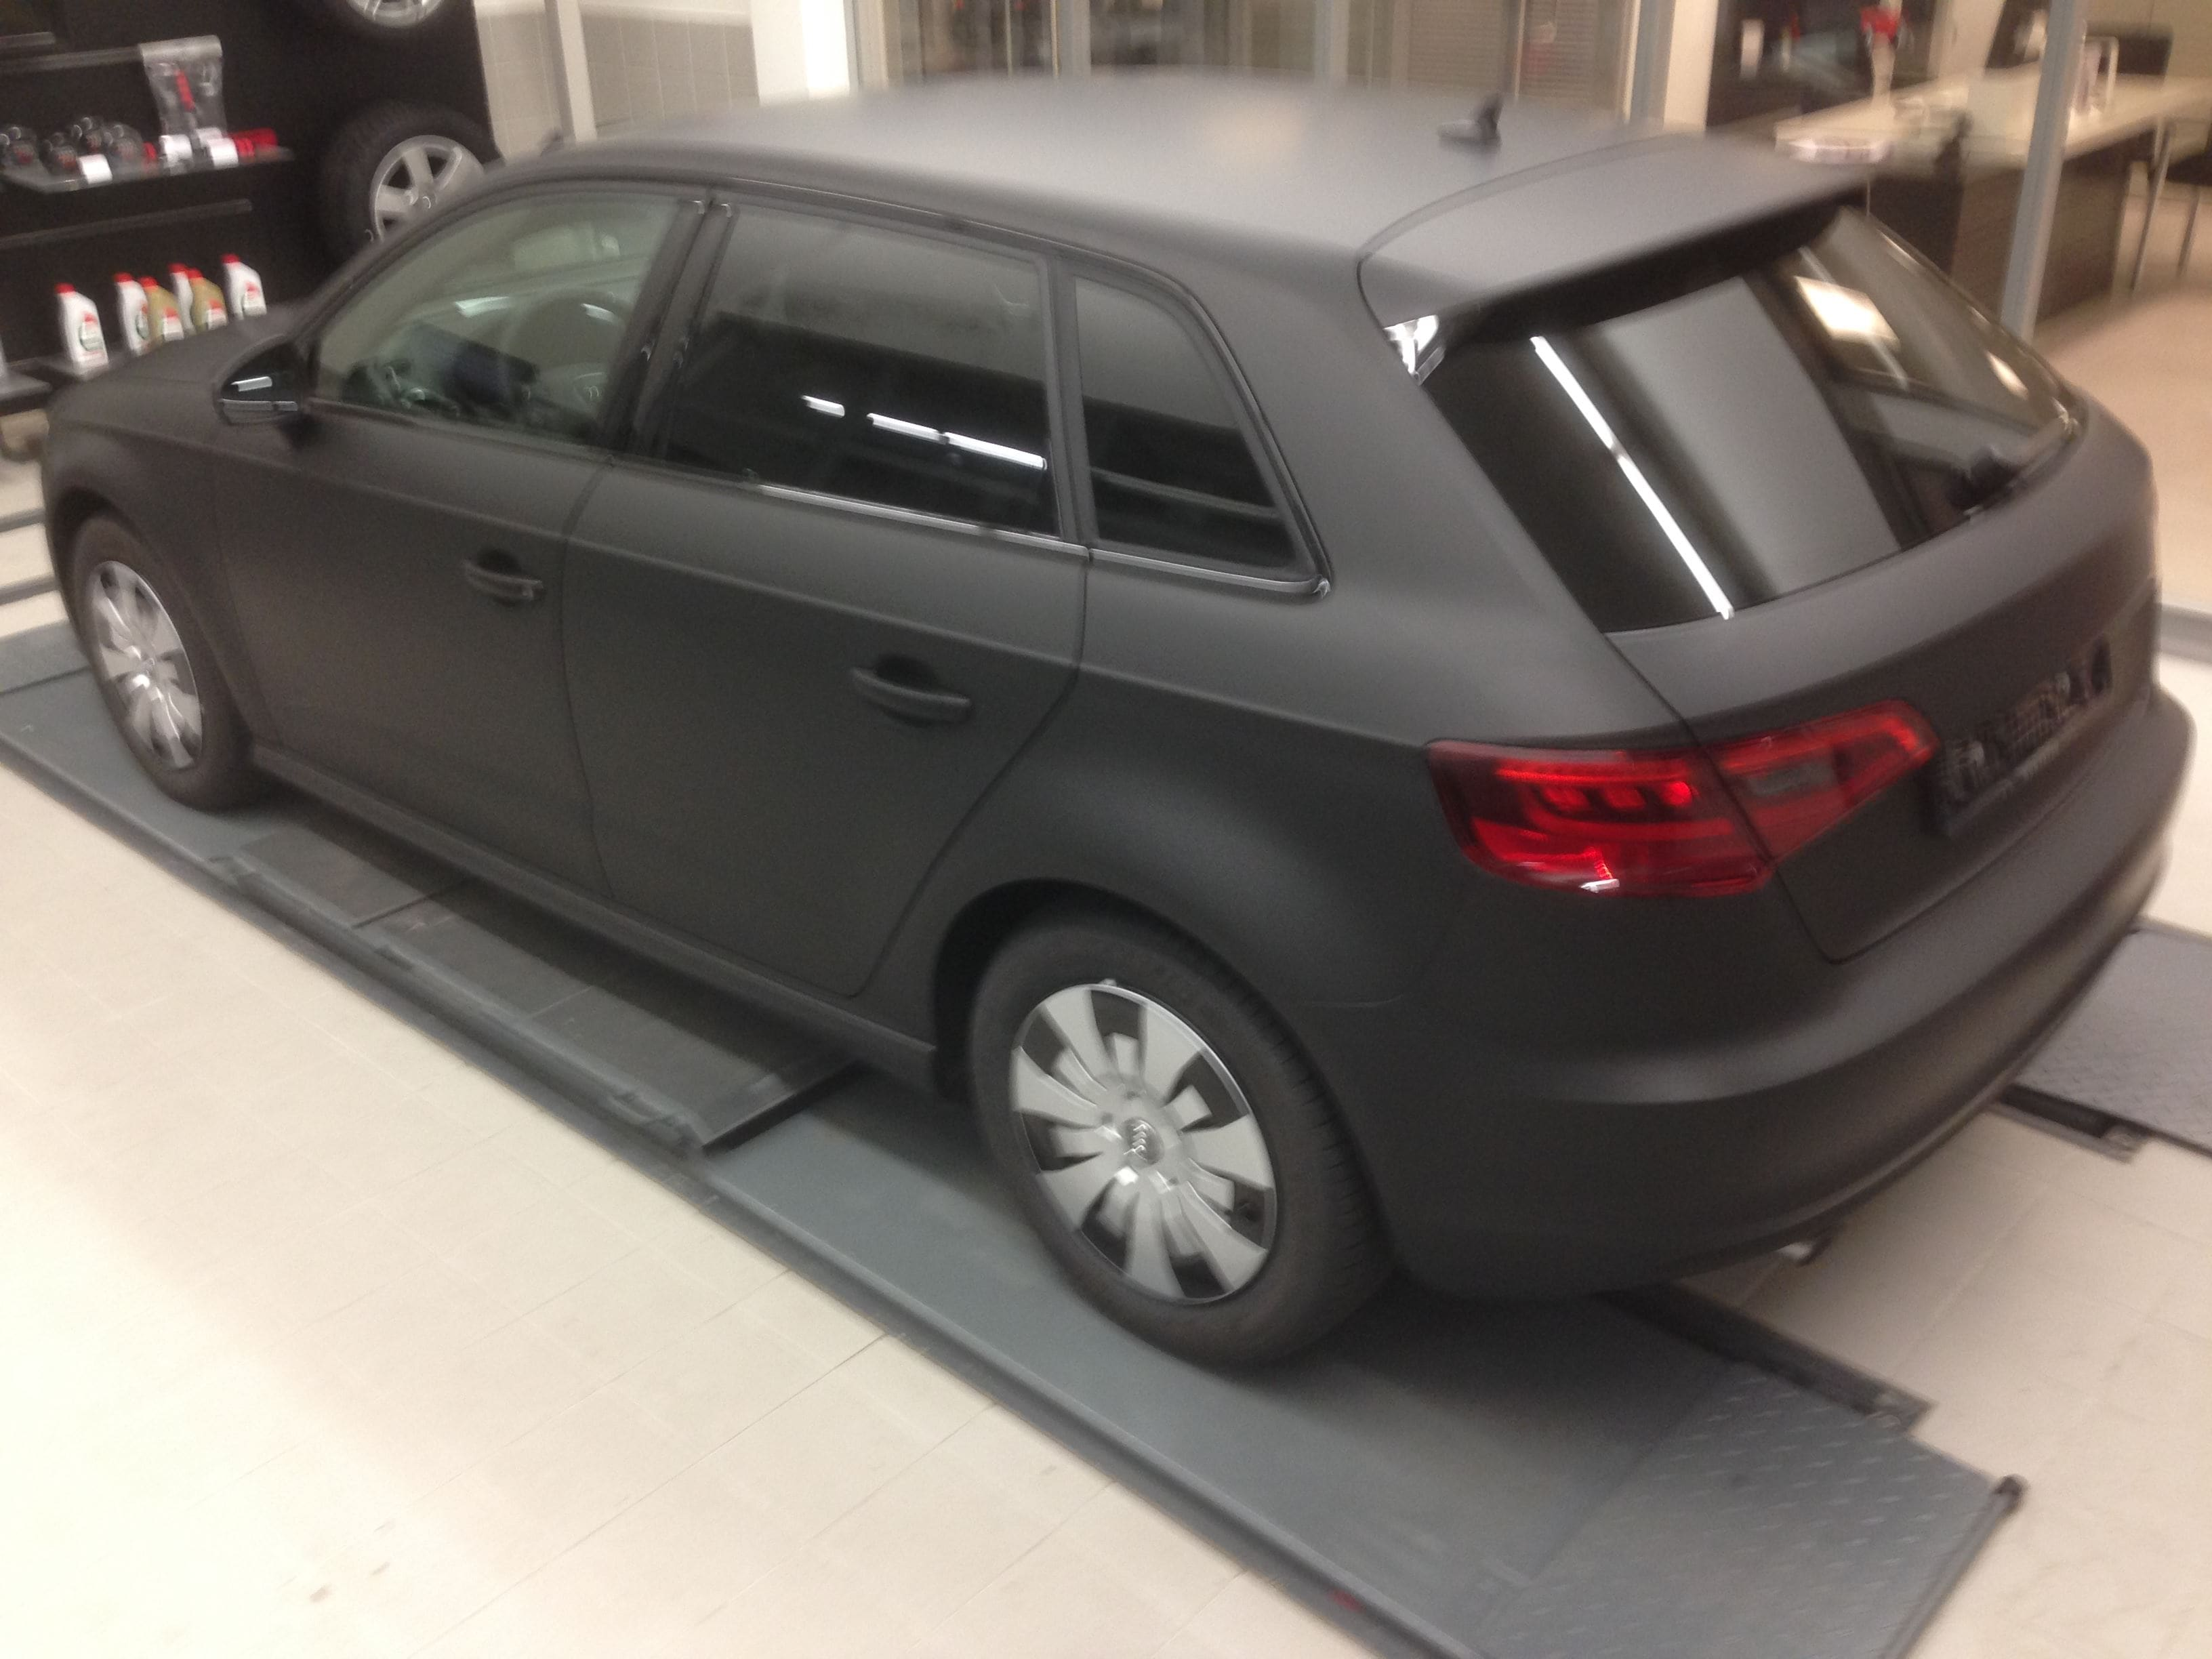 Audi A3 2014 met Mat Zwarte Wrap, Carwrapping door Wrapmyride.nu Foto-nr:4462, ©2021